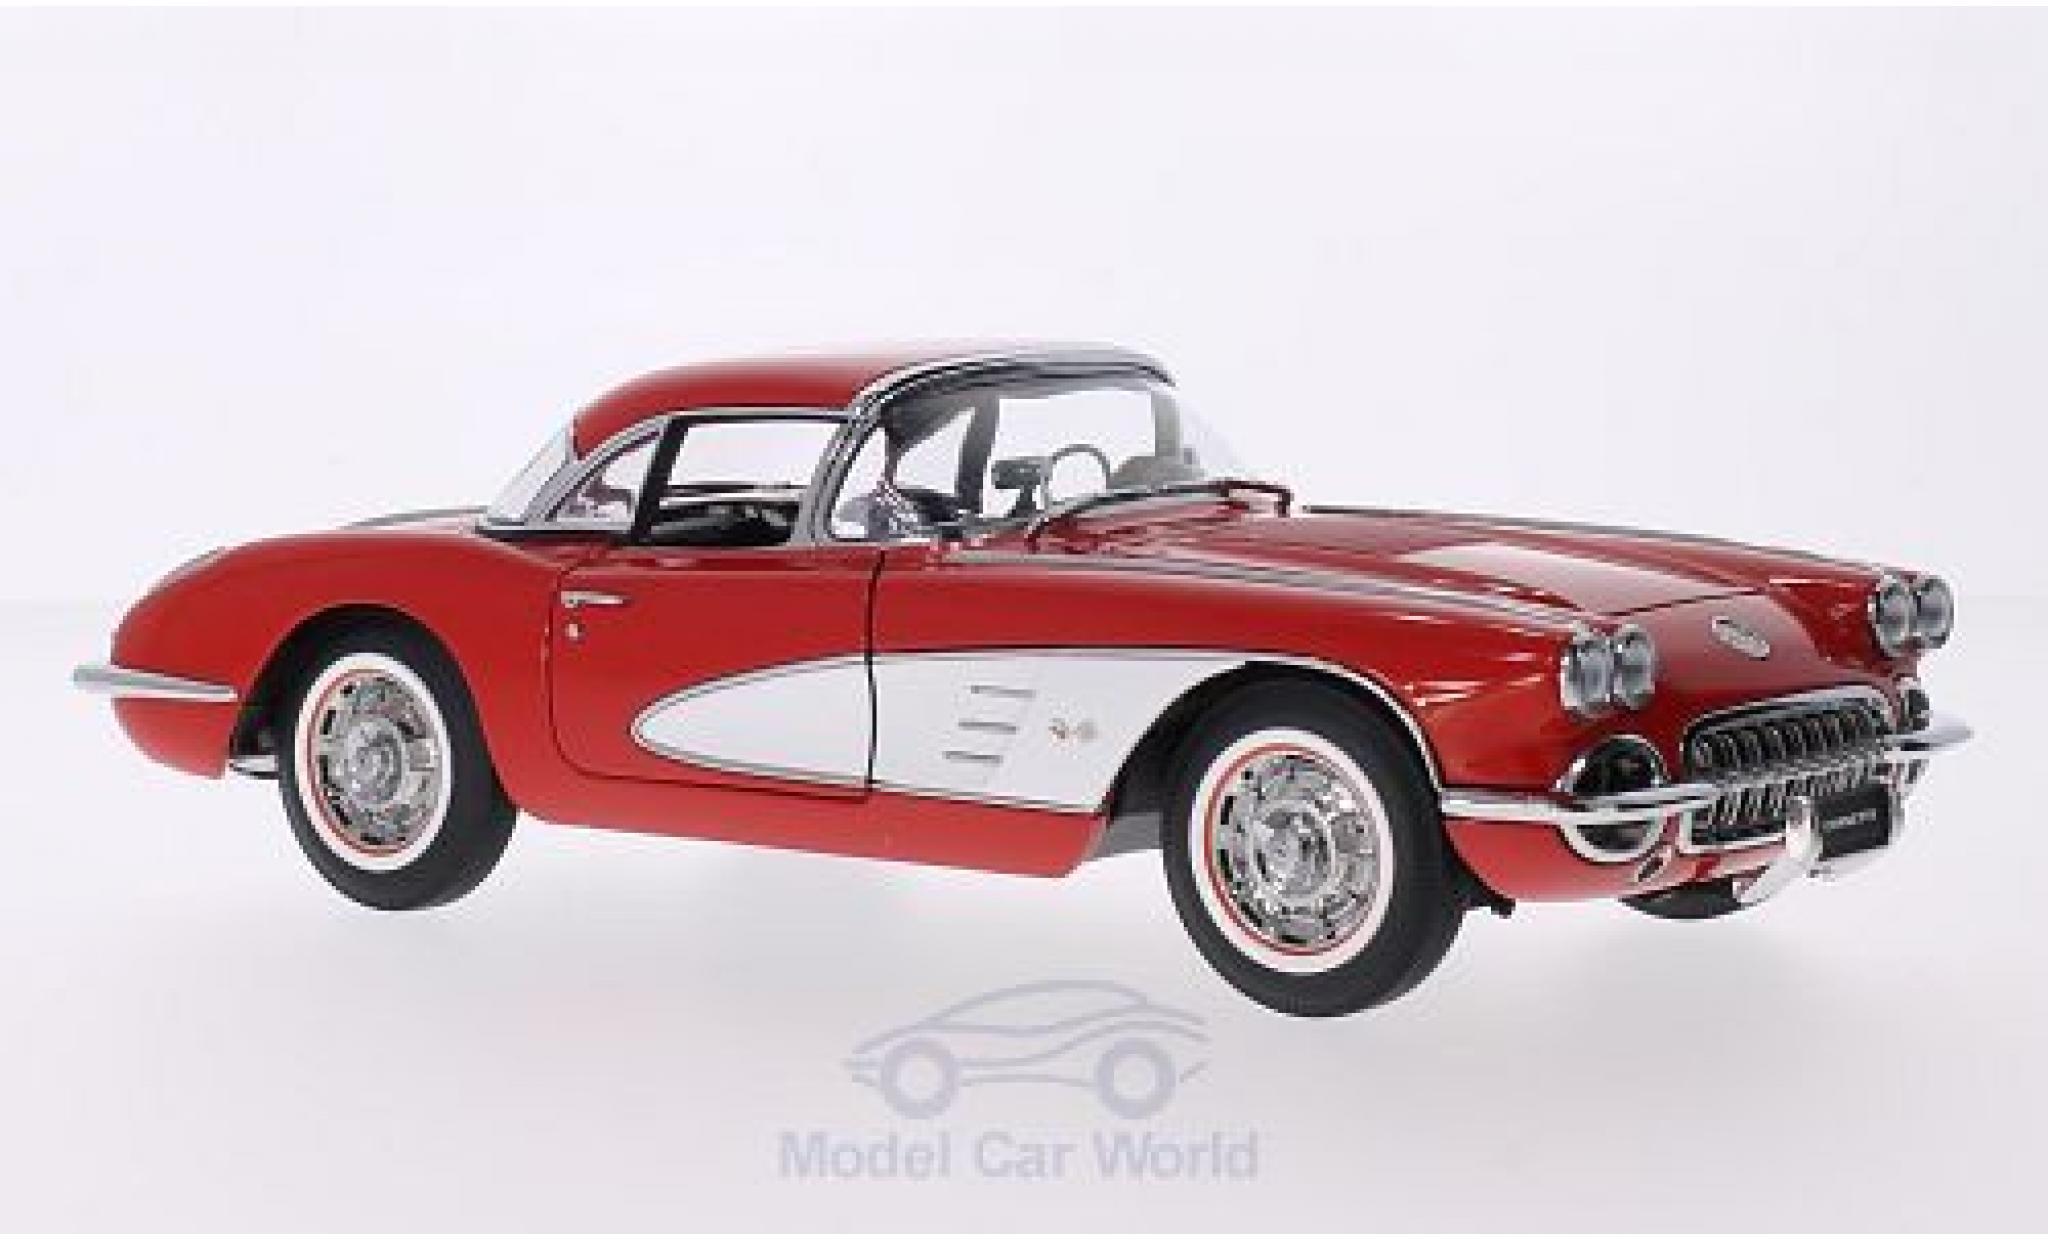 Chevrolet Corvette C1 1/18 AUTOart (C1) red/white 1958 Hardtop liegt bei